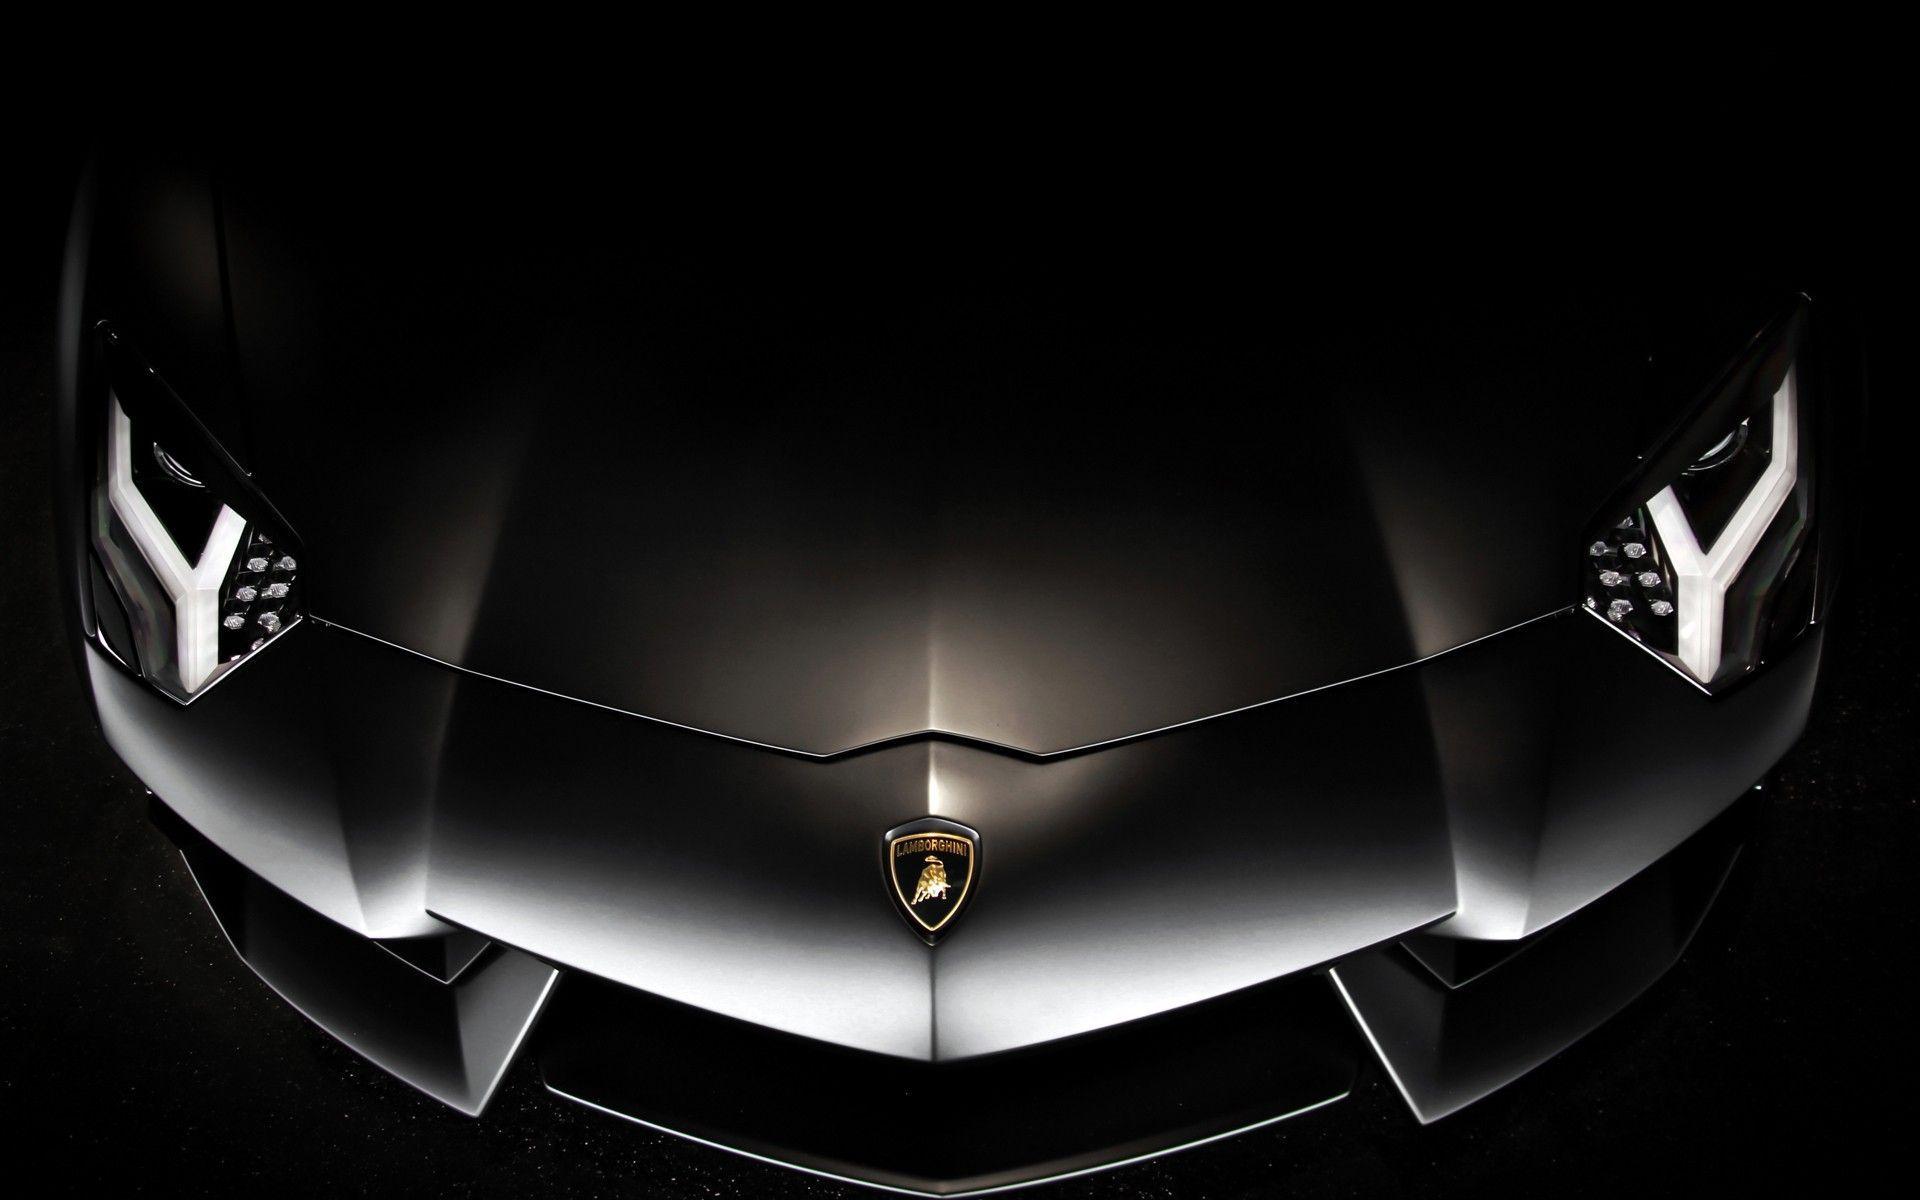 Lamborghini Aventador Full Hd Search Wallpaper Wpt7006466 1920x1200